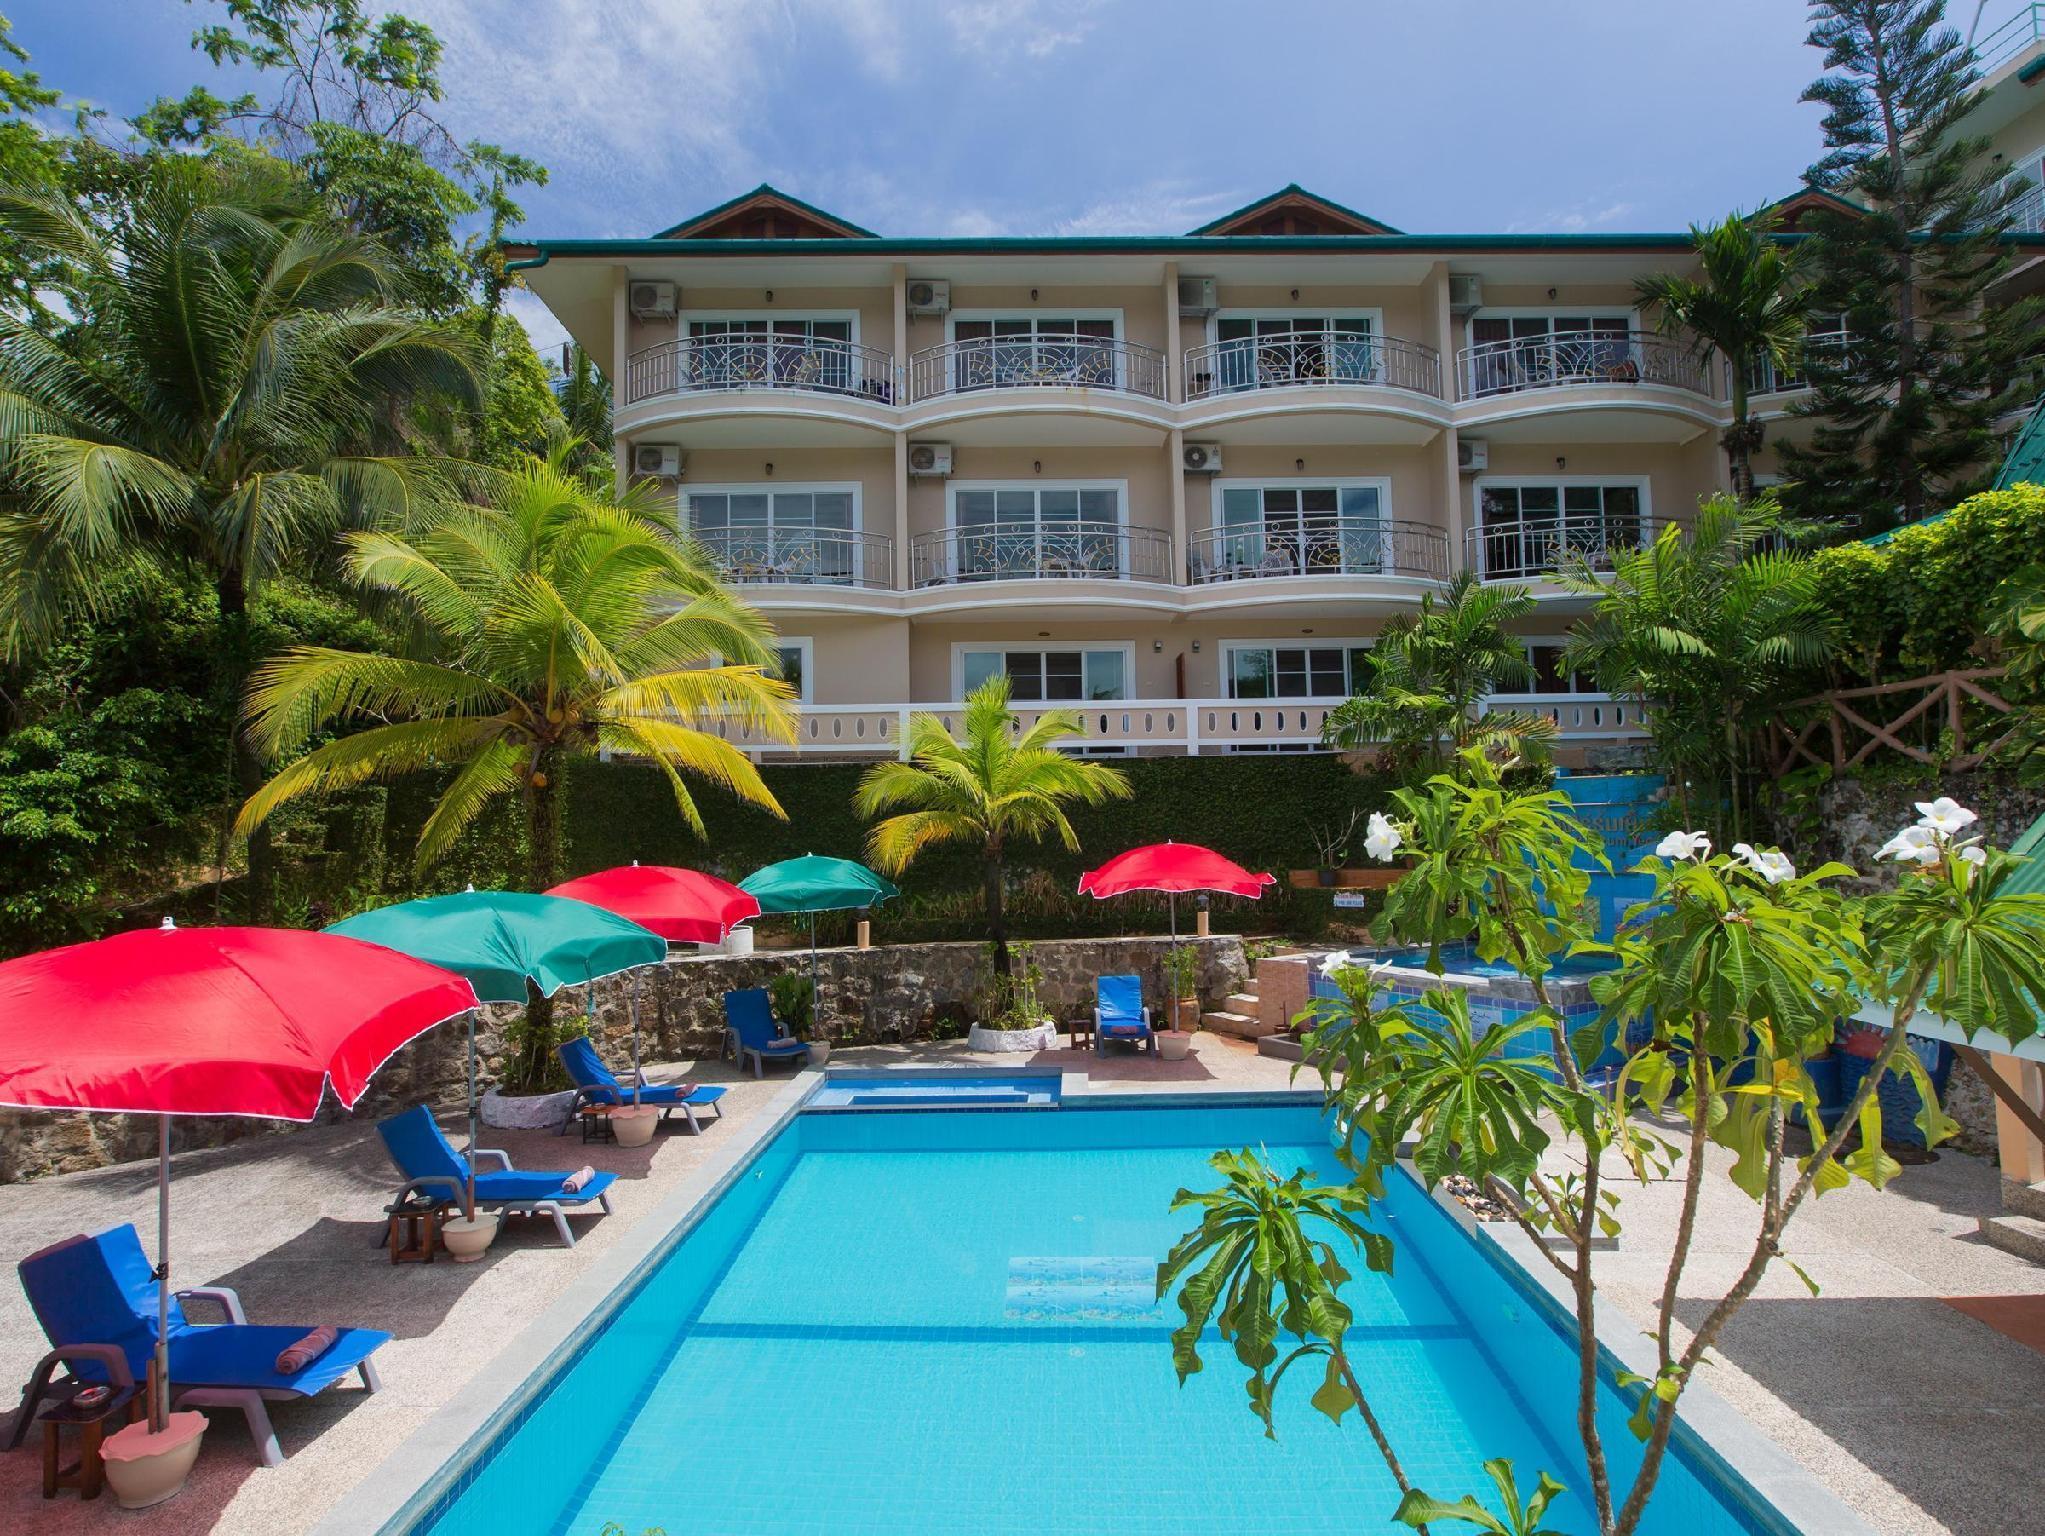 Patong Rai Rum Yen Resort ป่าตอง ไร่ร่มเย็น รีสอร์ท